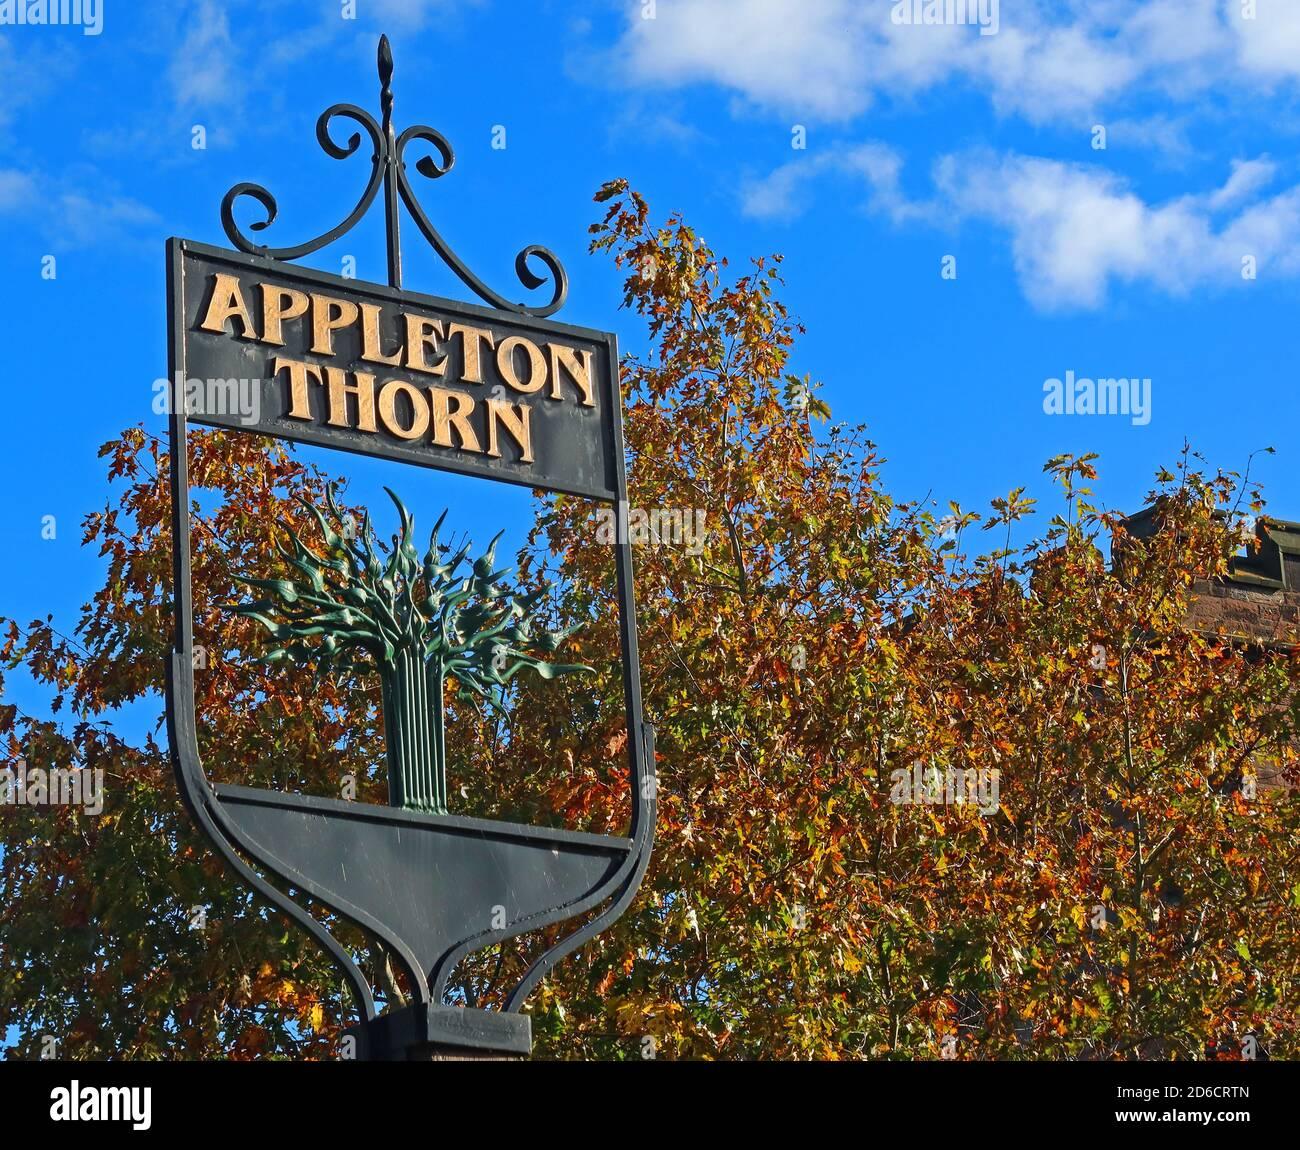 Dieses Stockfoto: Appleton Thorn Village Schild, Lumb Brook Road, Grappenhall Lane, Appleton Thorn, Warrington, Cheshire, England, UK, WA4 4QX - 2D6CRT